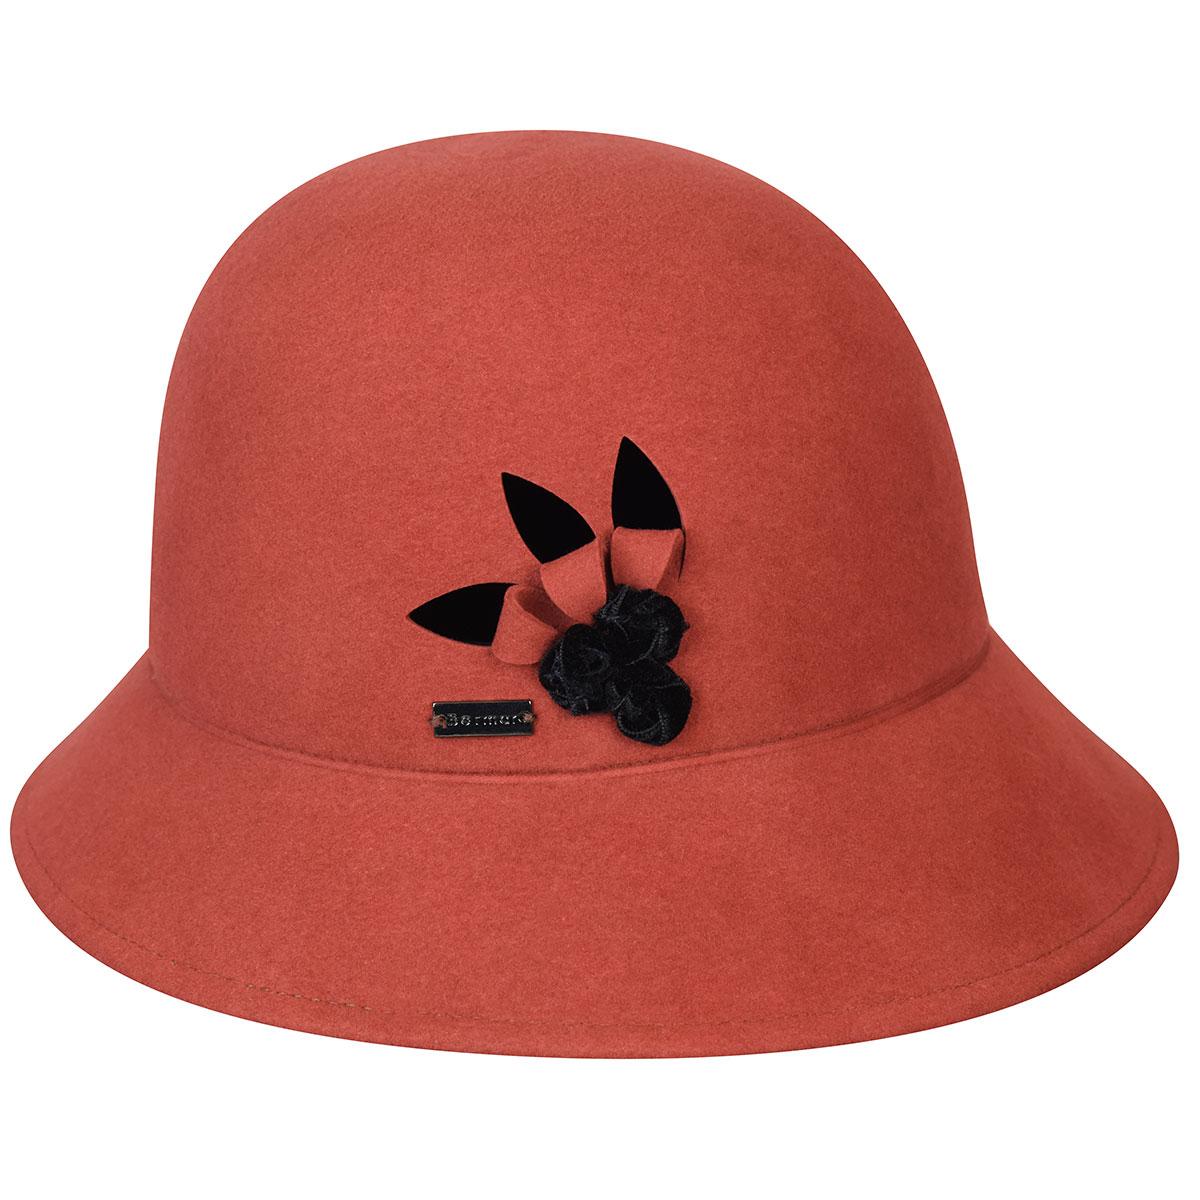 1930s Style Hats   Buy 30s Ladies Hats Joelle Cloche $120.00 AT vintagedancer.com